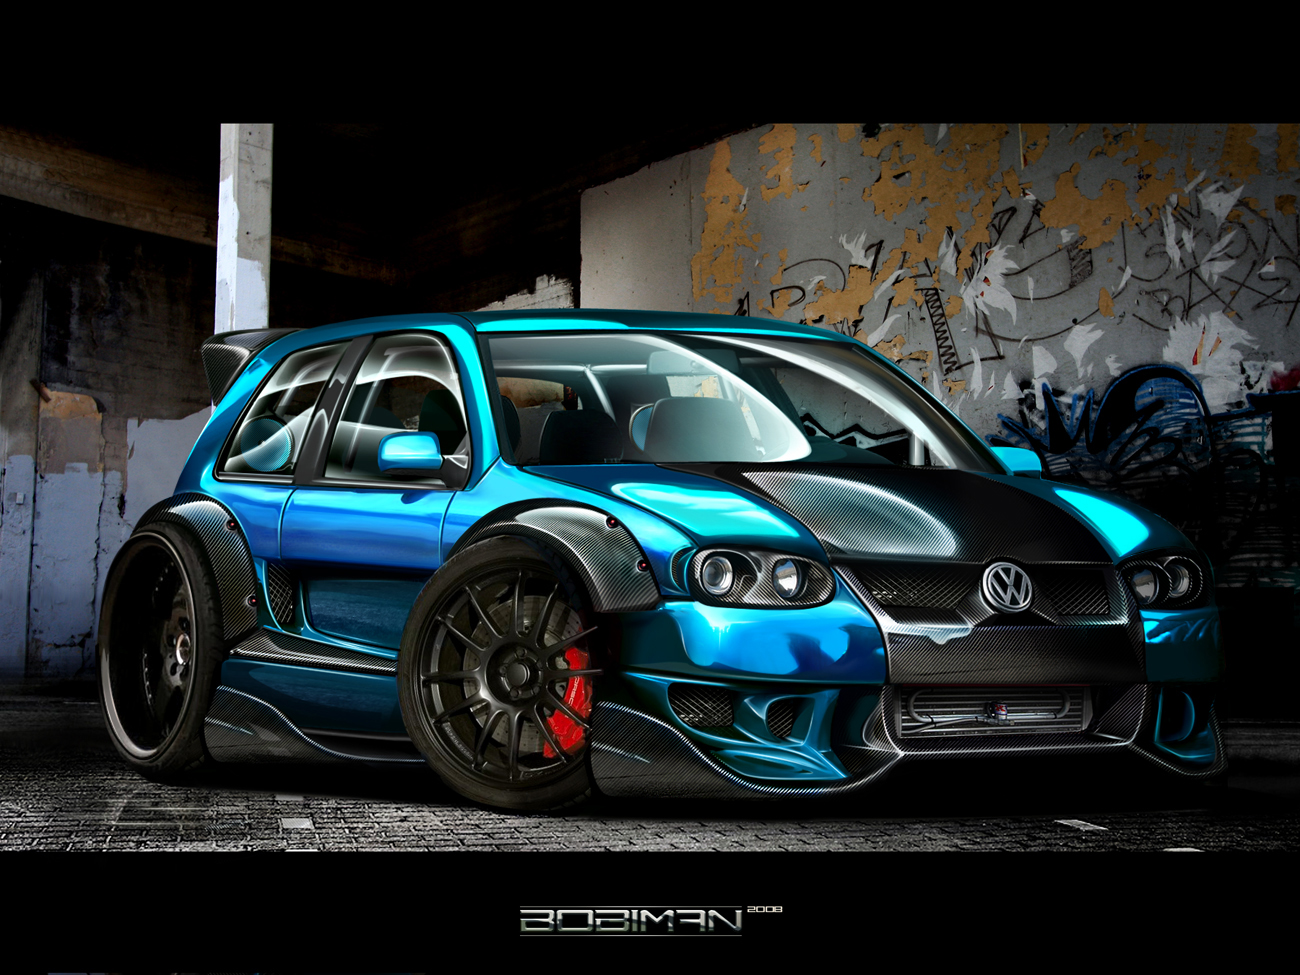 http://3.bp.blogspot.com/-ngVFqit2sHw/TjpBdWHyBWI/AAAAAAAAC8k/Oil5gig2XcQ/s1600/Amazing-Cars-HD-wallpaper-%2B12.jpg